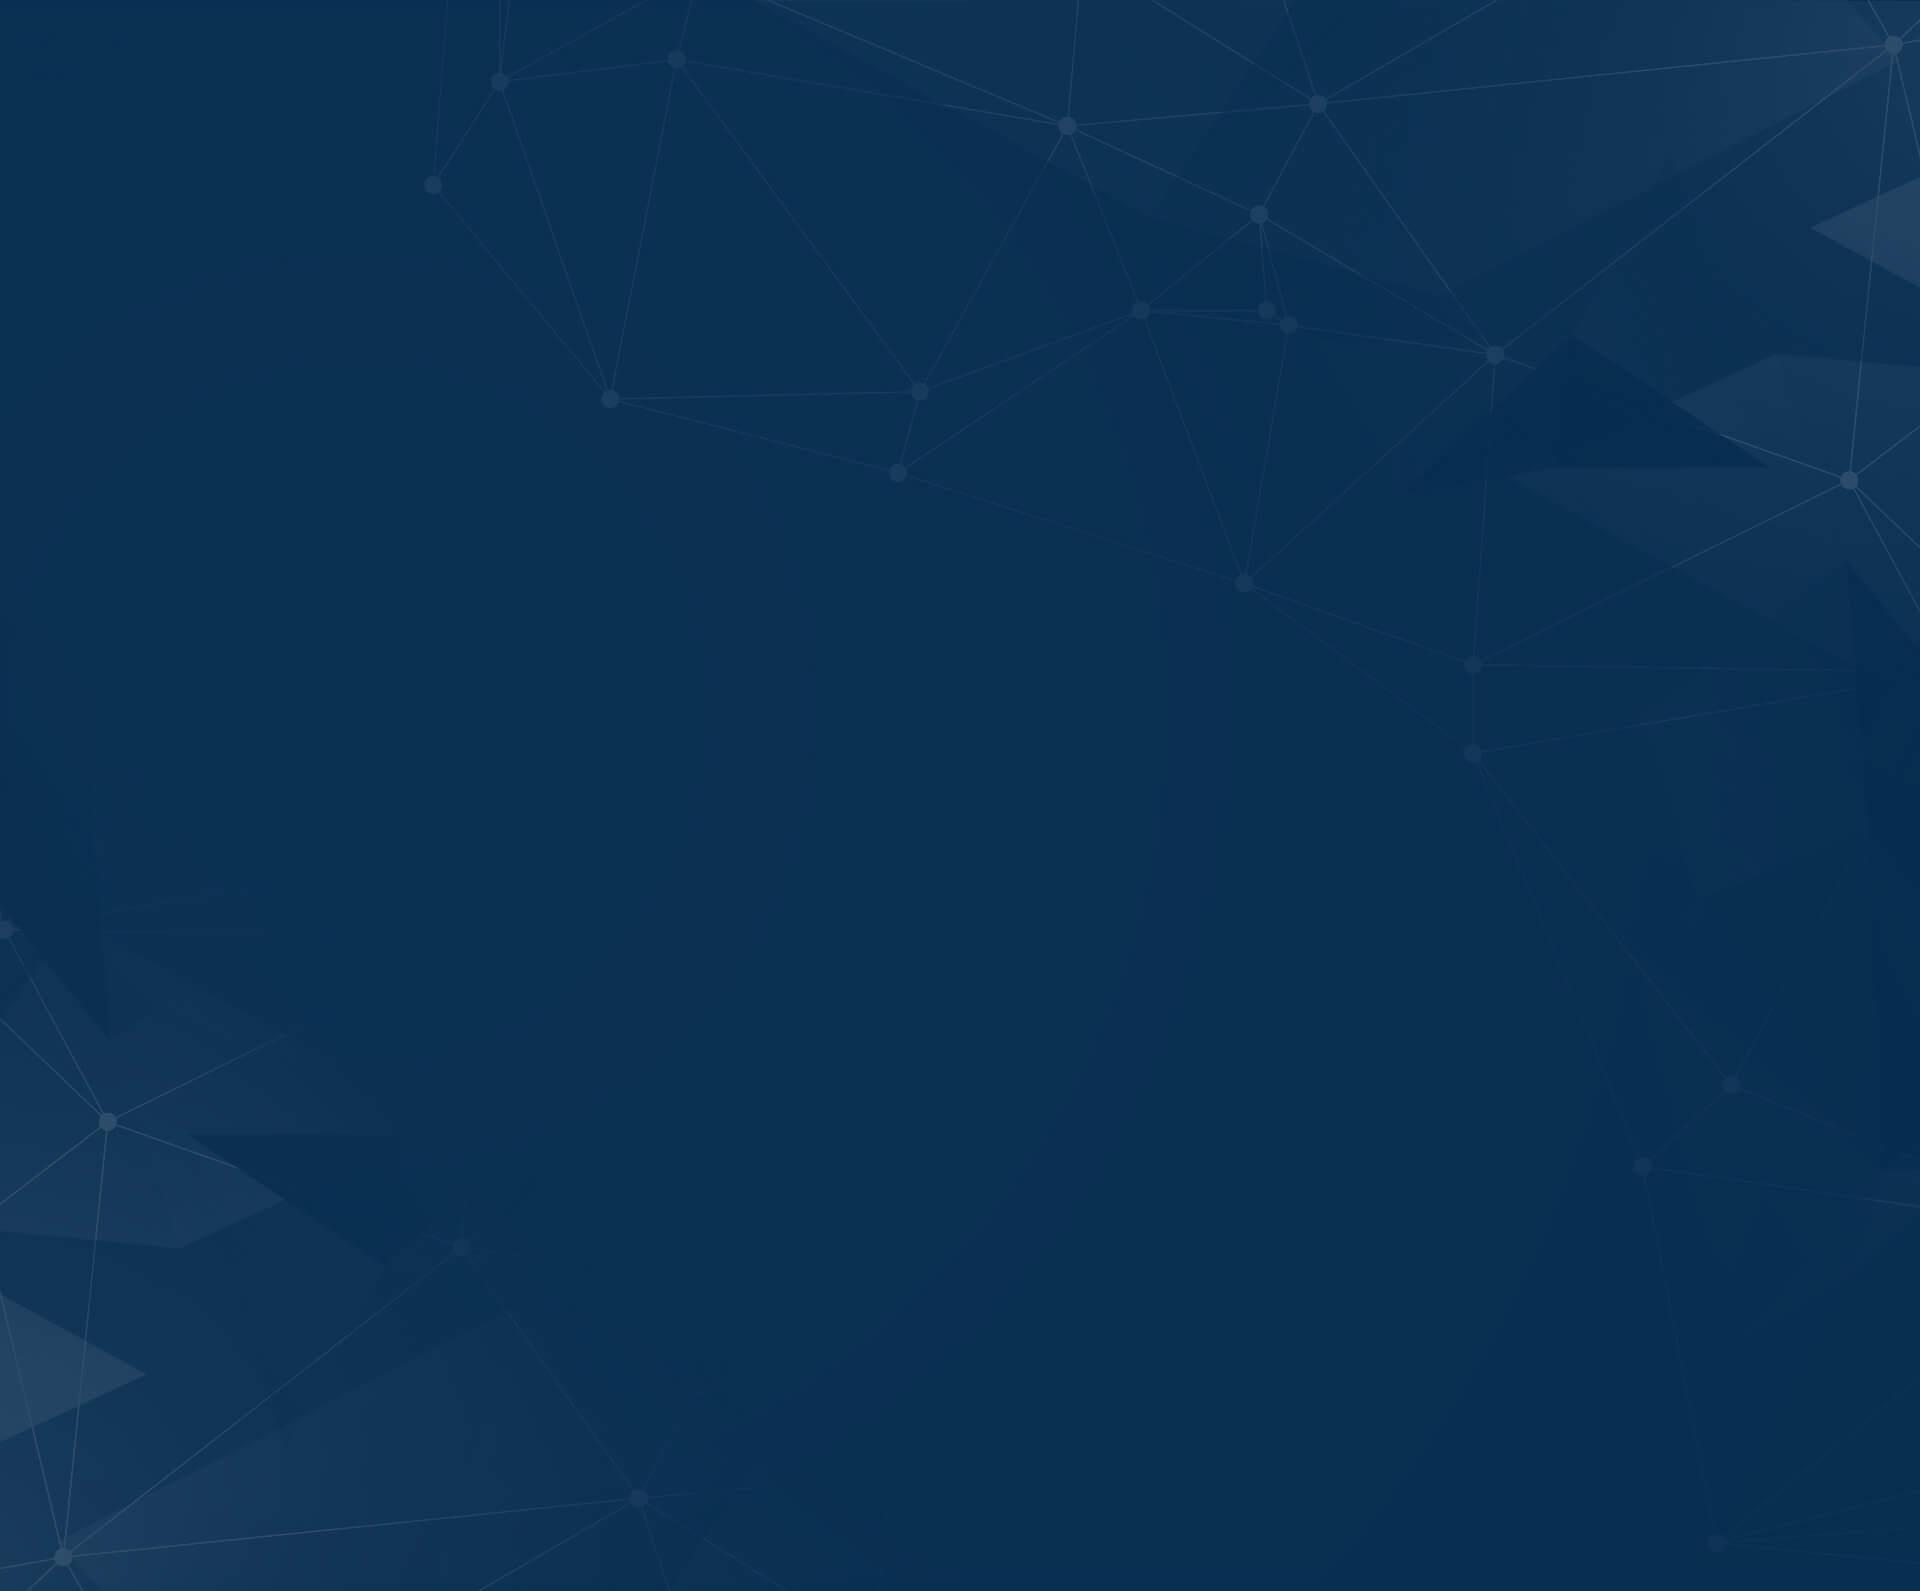 ReactJS Development Services To Build Experience-Driven Businesses